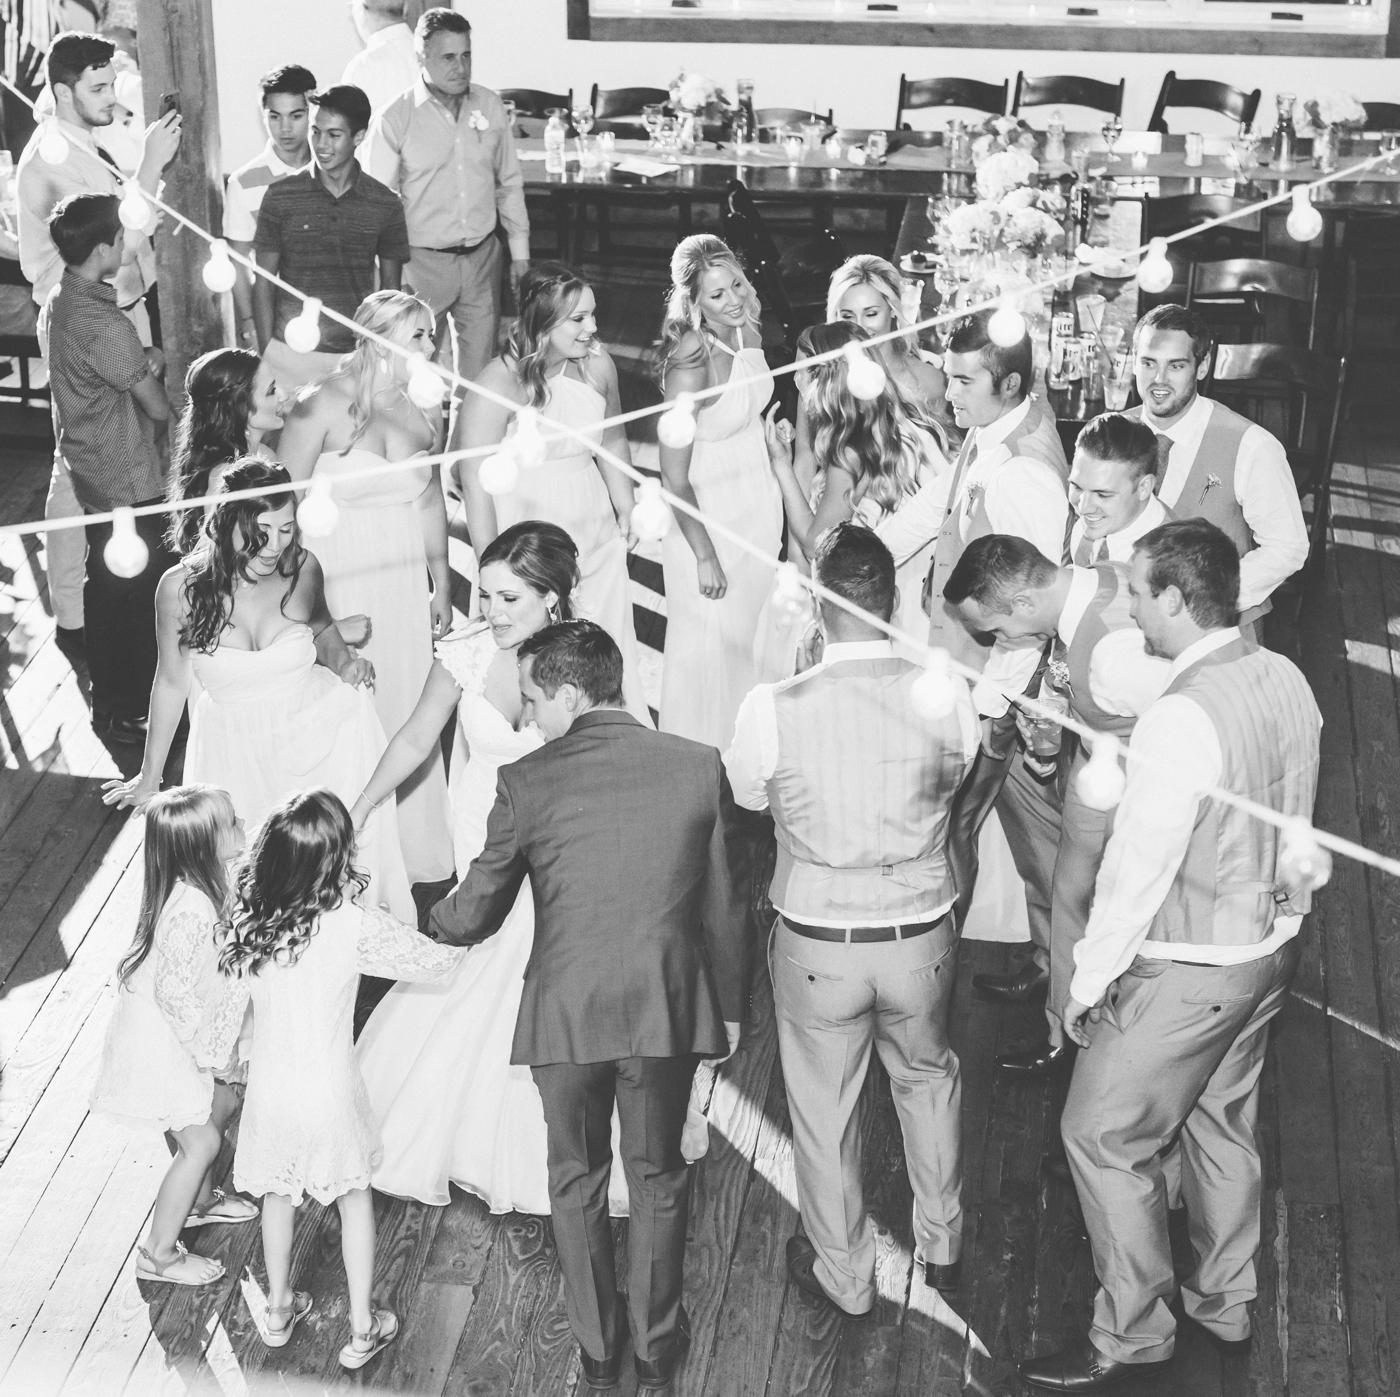 chicago-fine-art-wedding-photography-chiapetta49